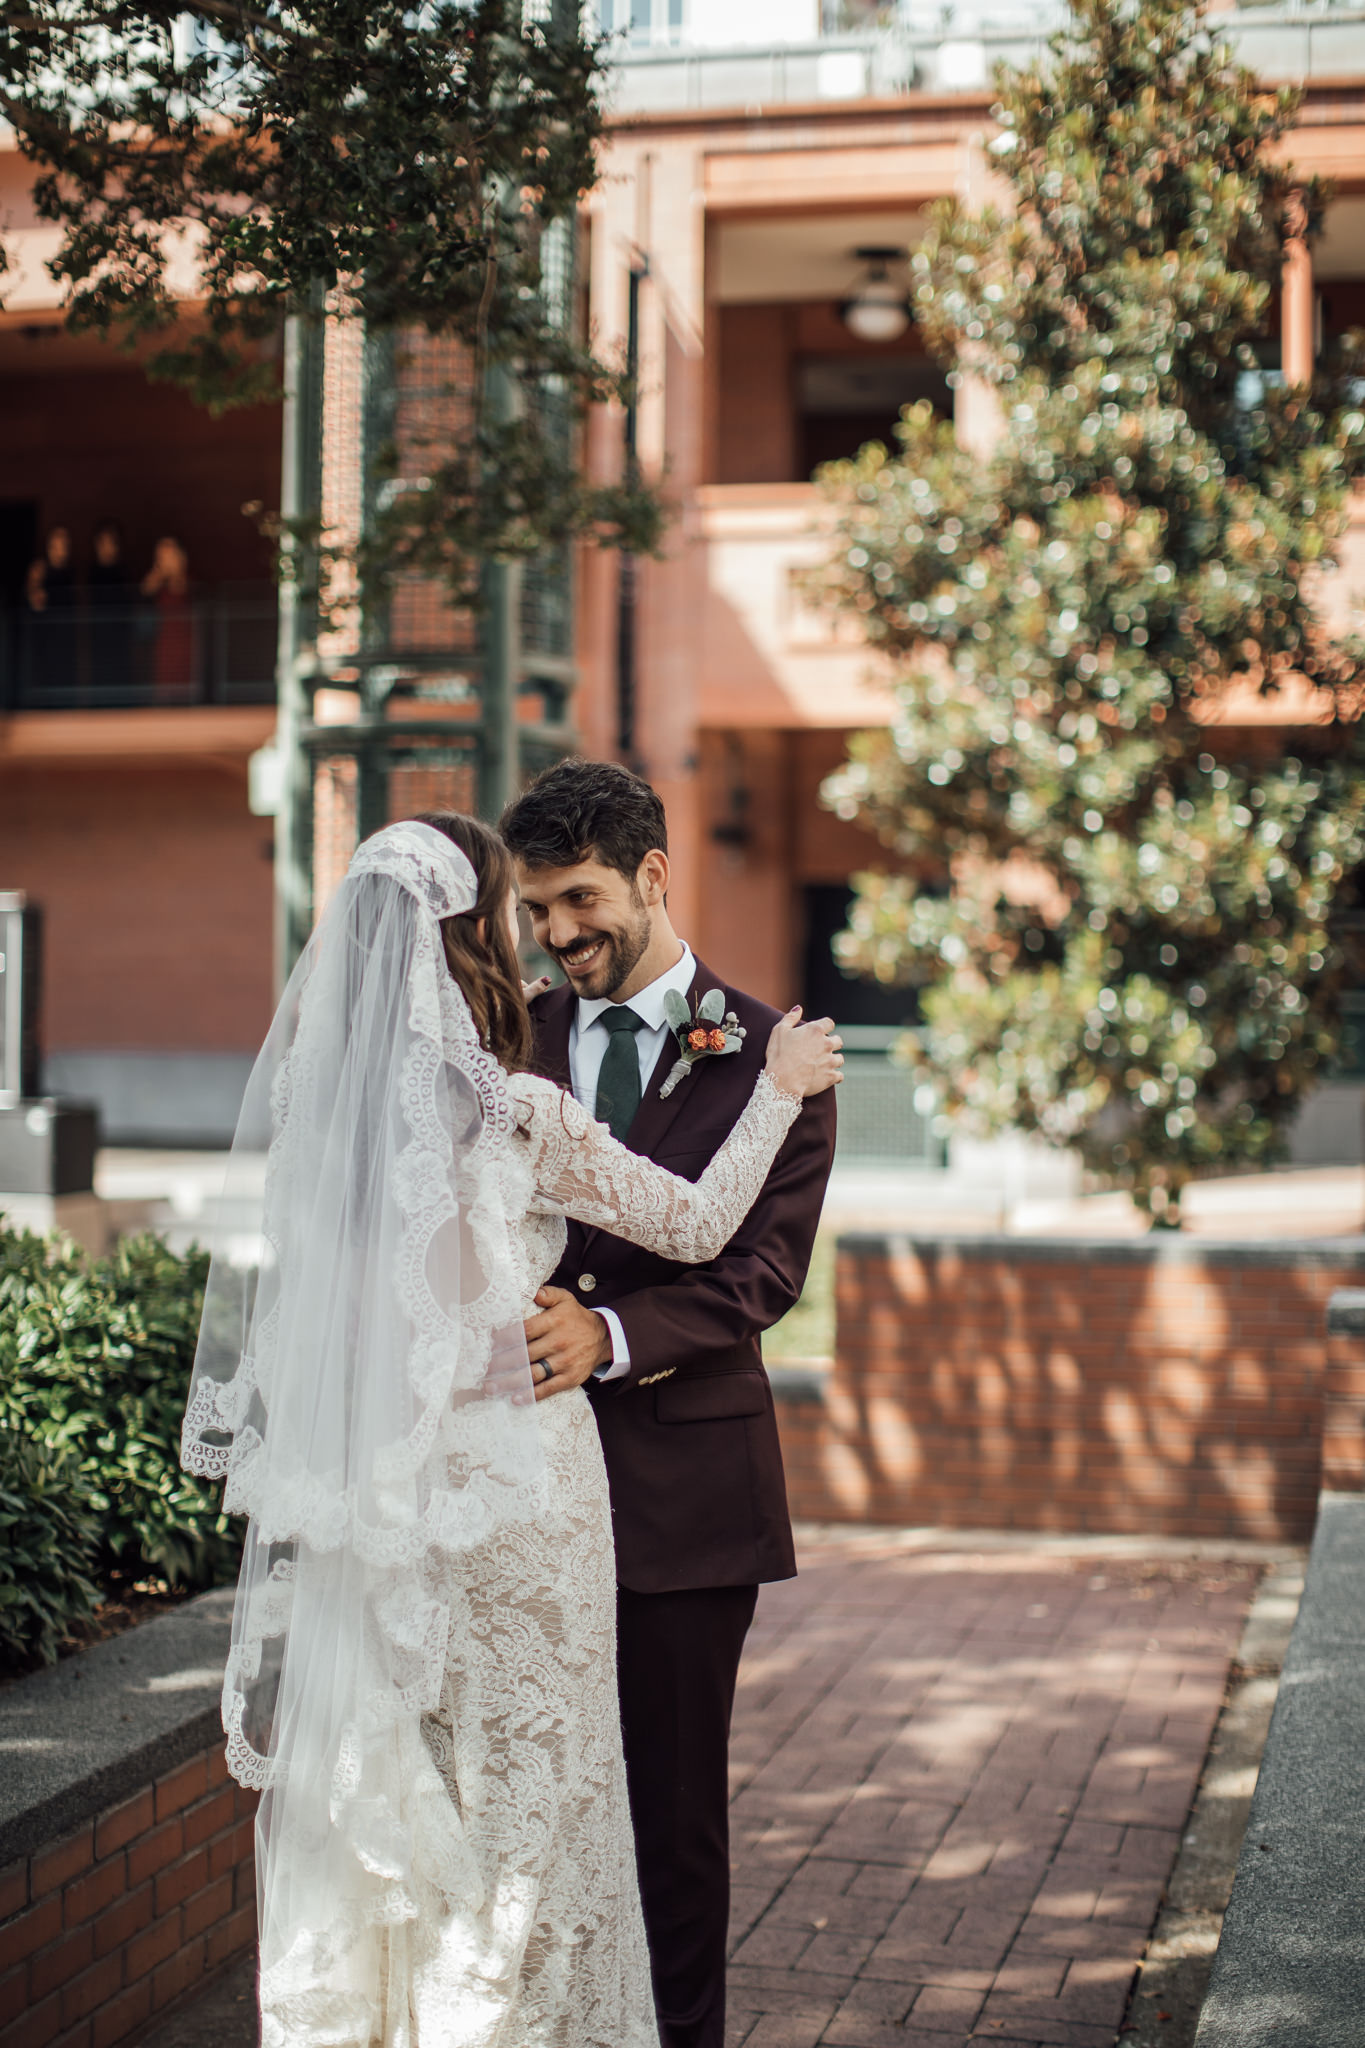 cassie-cook-photography-chattanooga-wedding-photographer-waterhouse-pavillion-cassie-matt-wedding-23.jpg